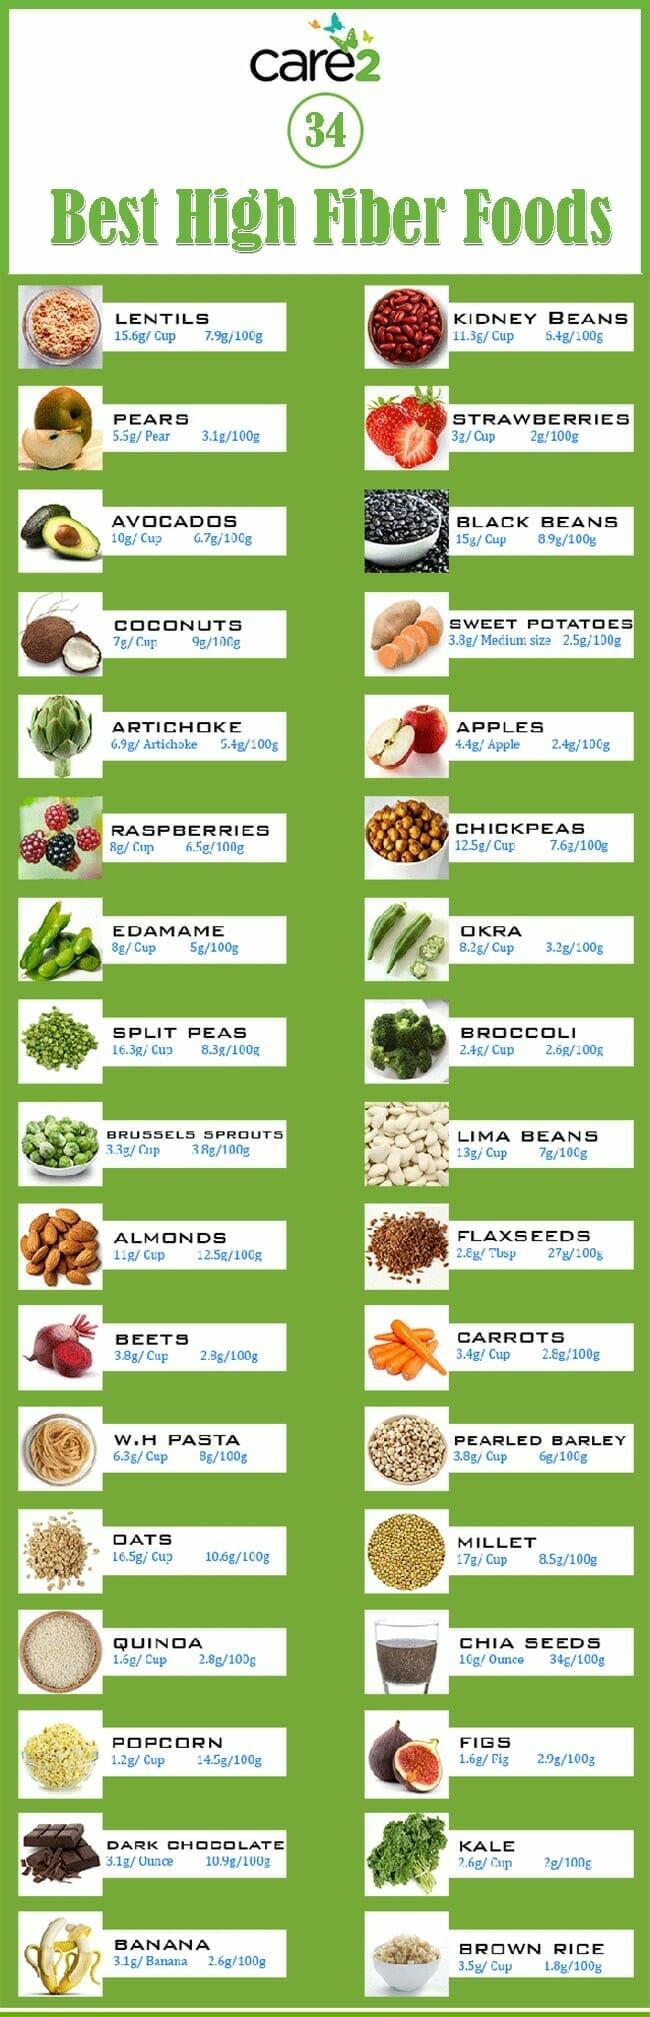 list of foods on non-fiber diet